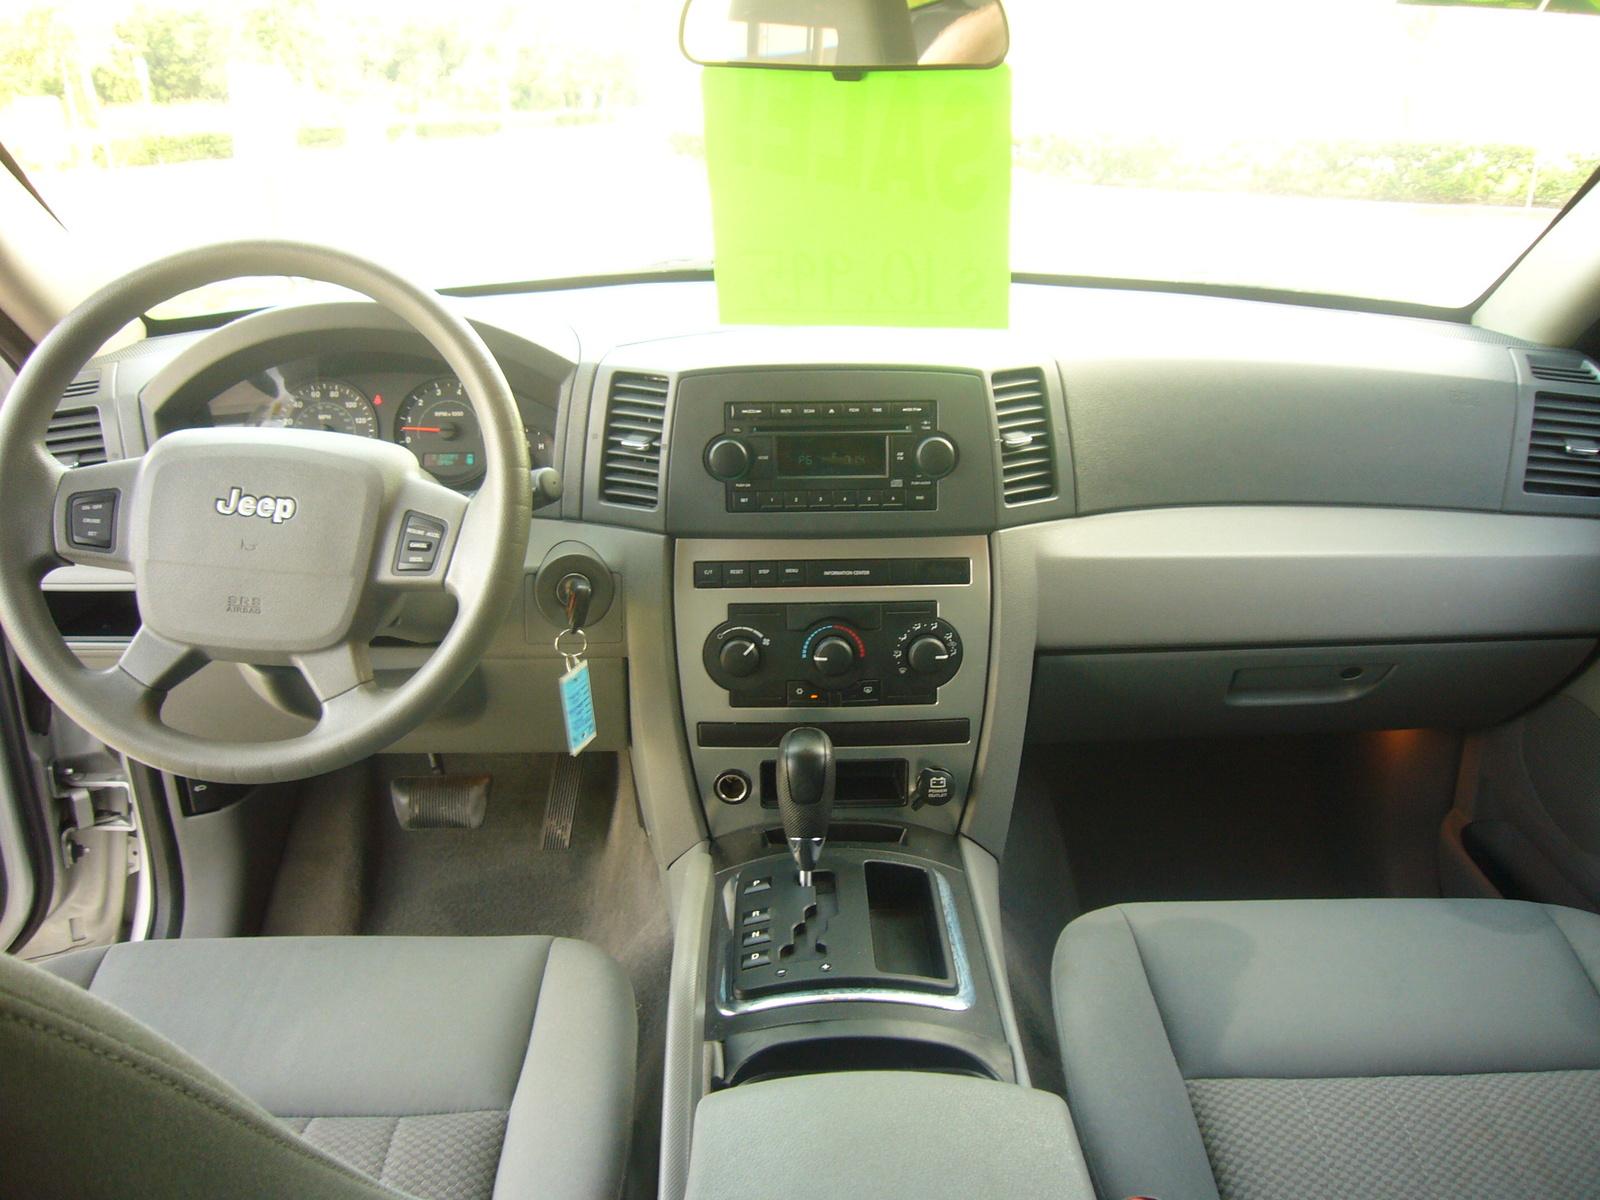 2005 jeep grand cherokee interior pictures cargurus - 2005 jeep grand cherokee laredo interior ...